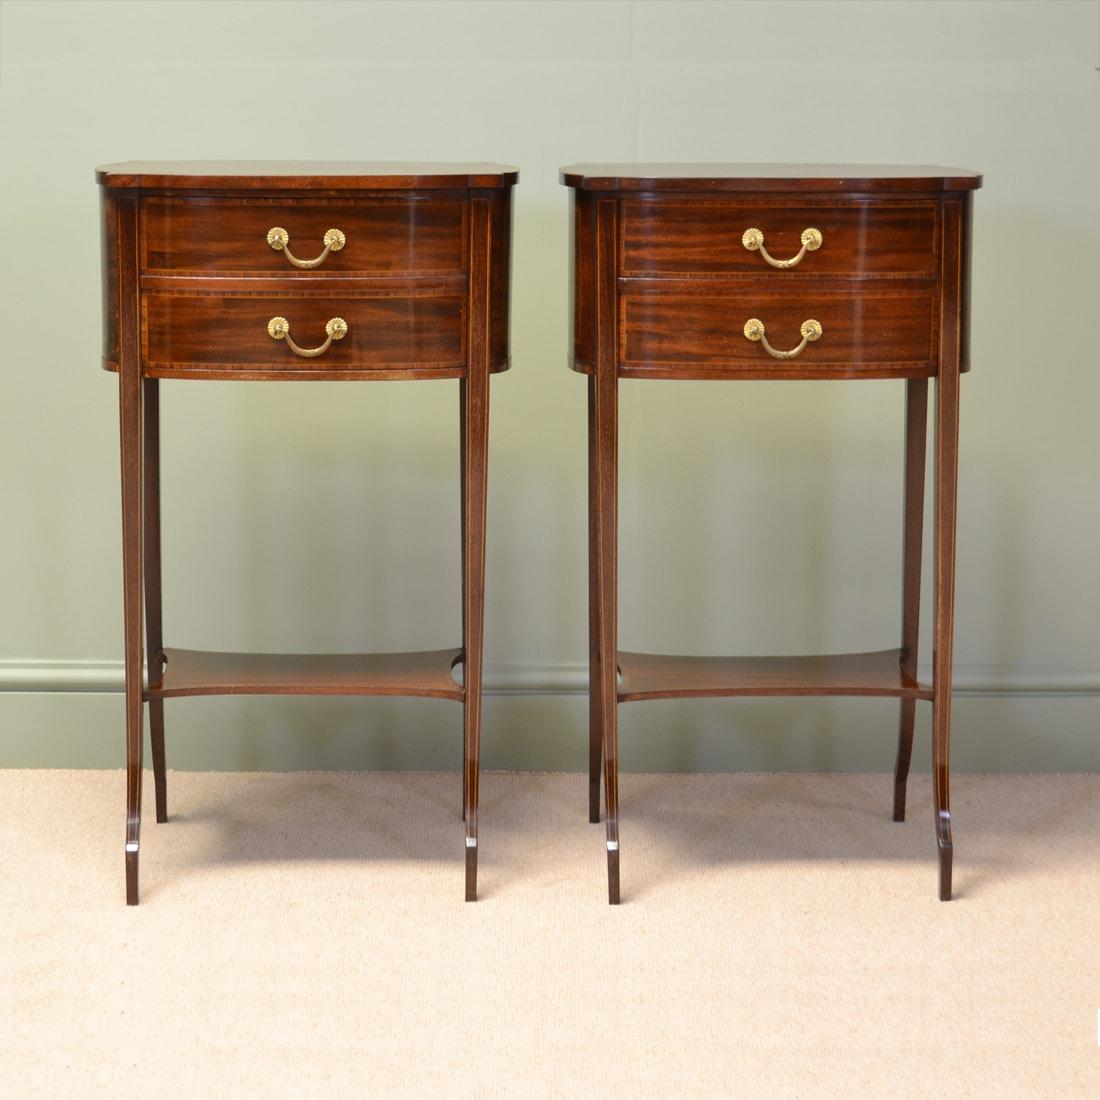 Maple & Co Antique Furniture - Antiques World